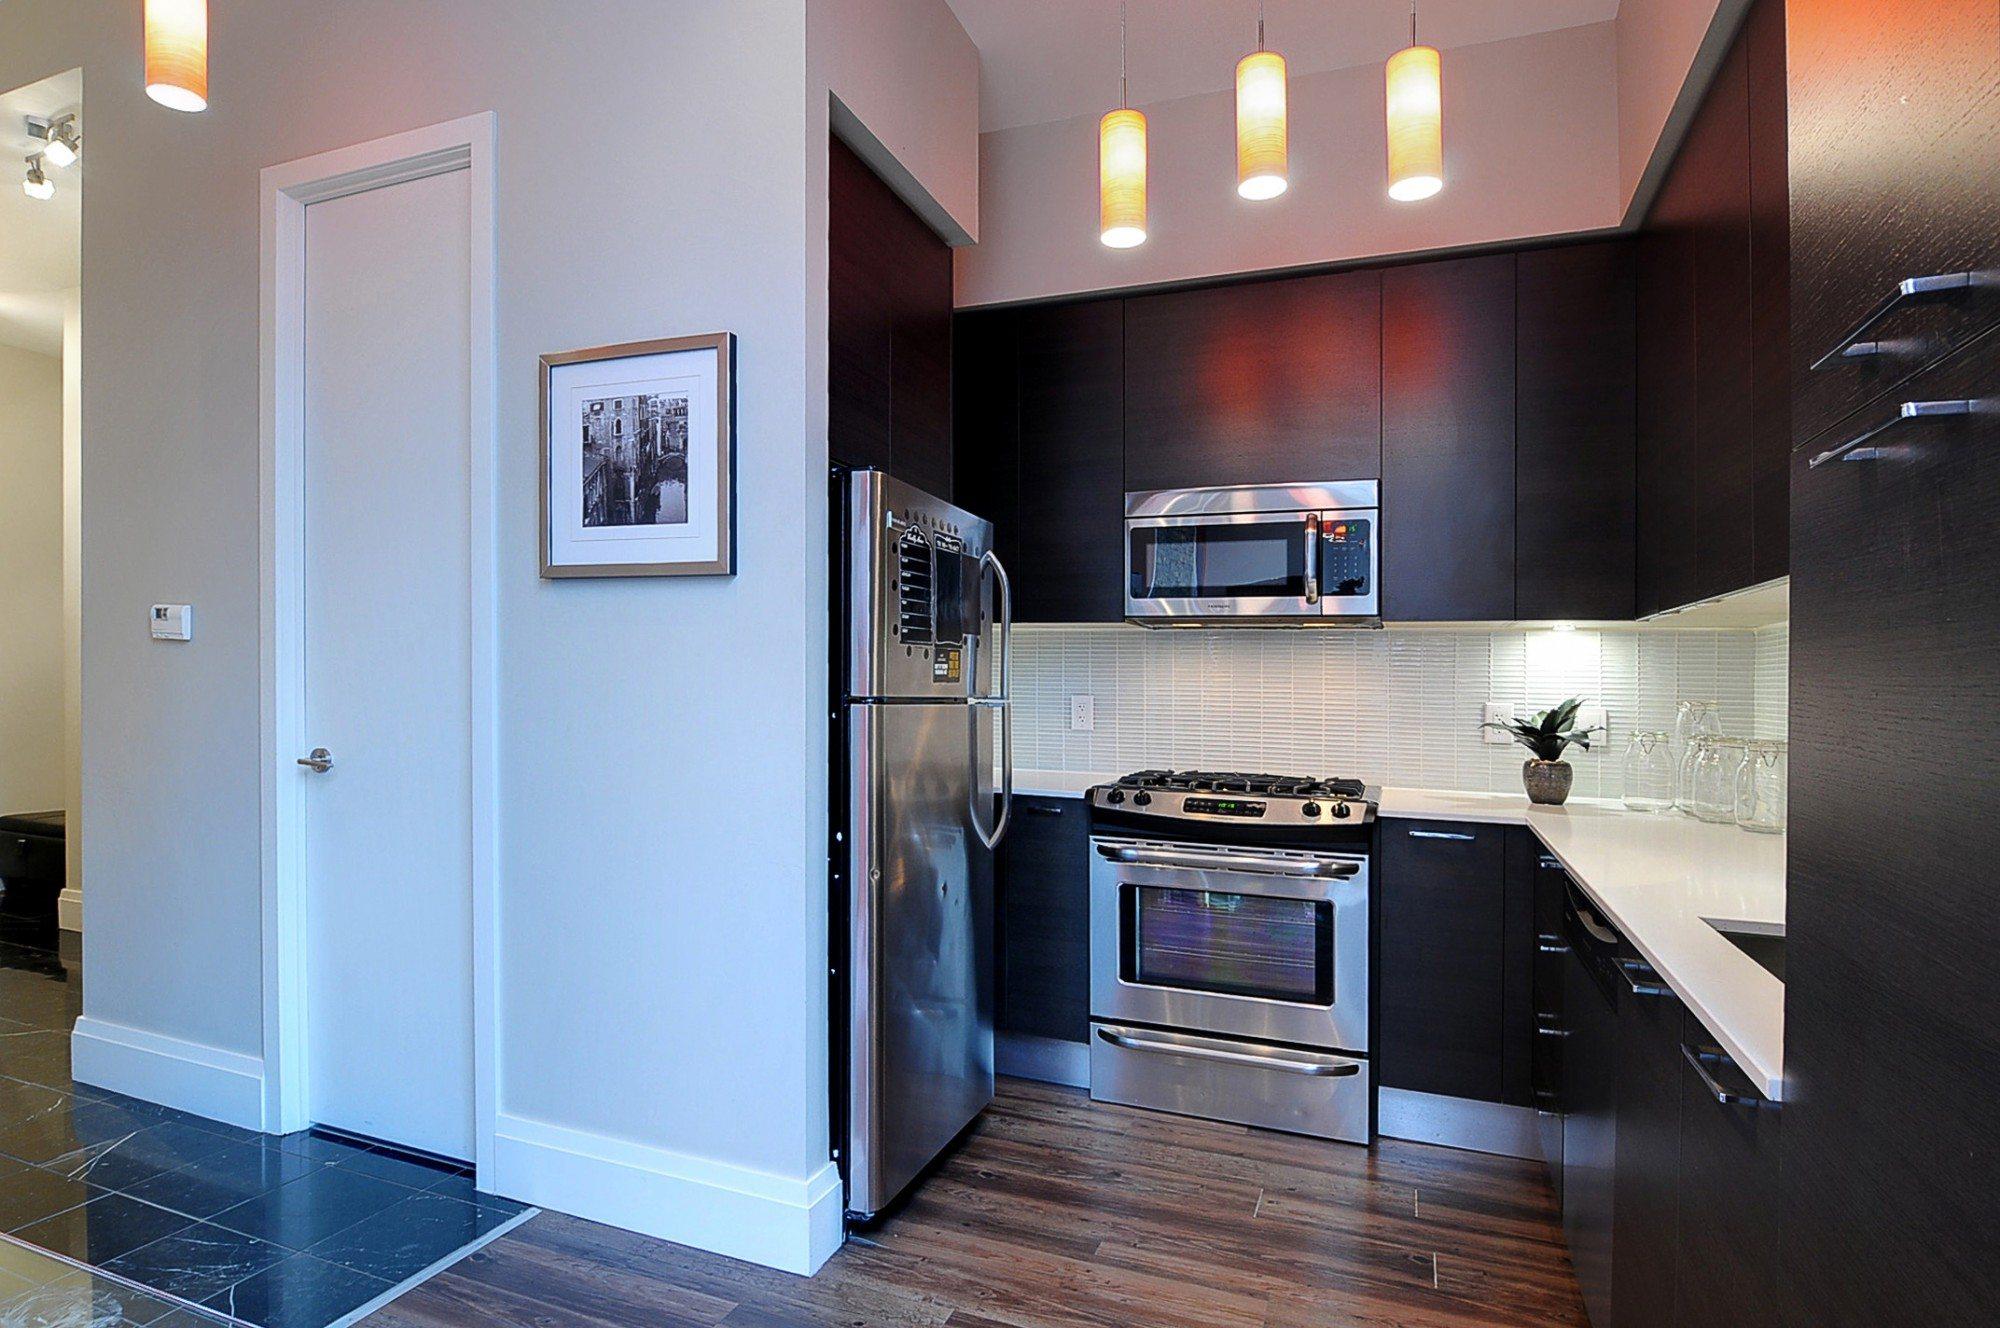 toronto-condo-for-sale-399-adelaide-street-west-kitchen